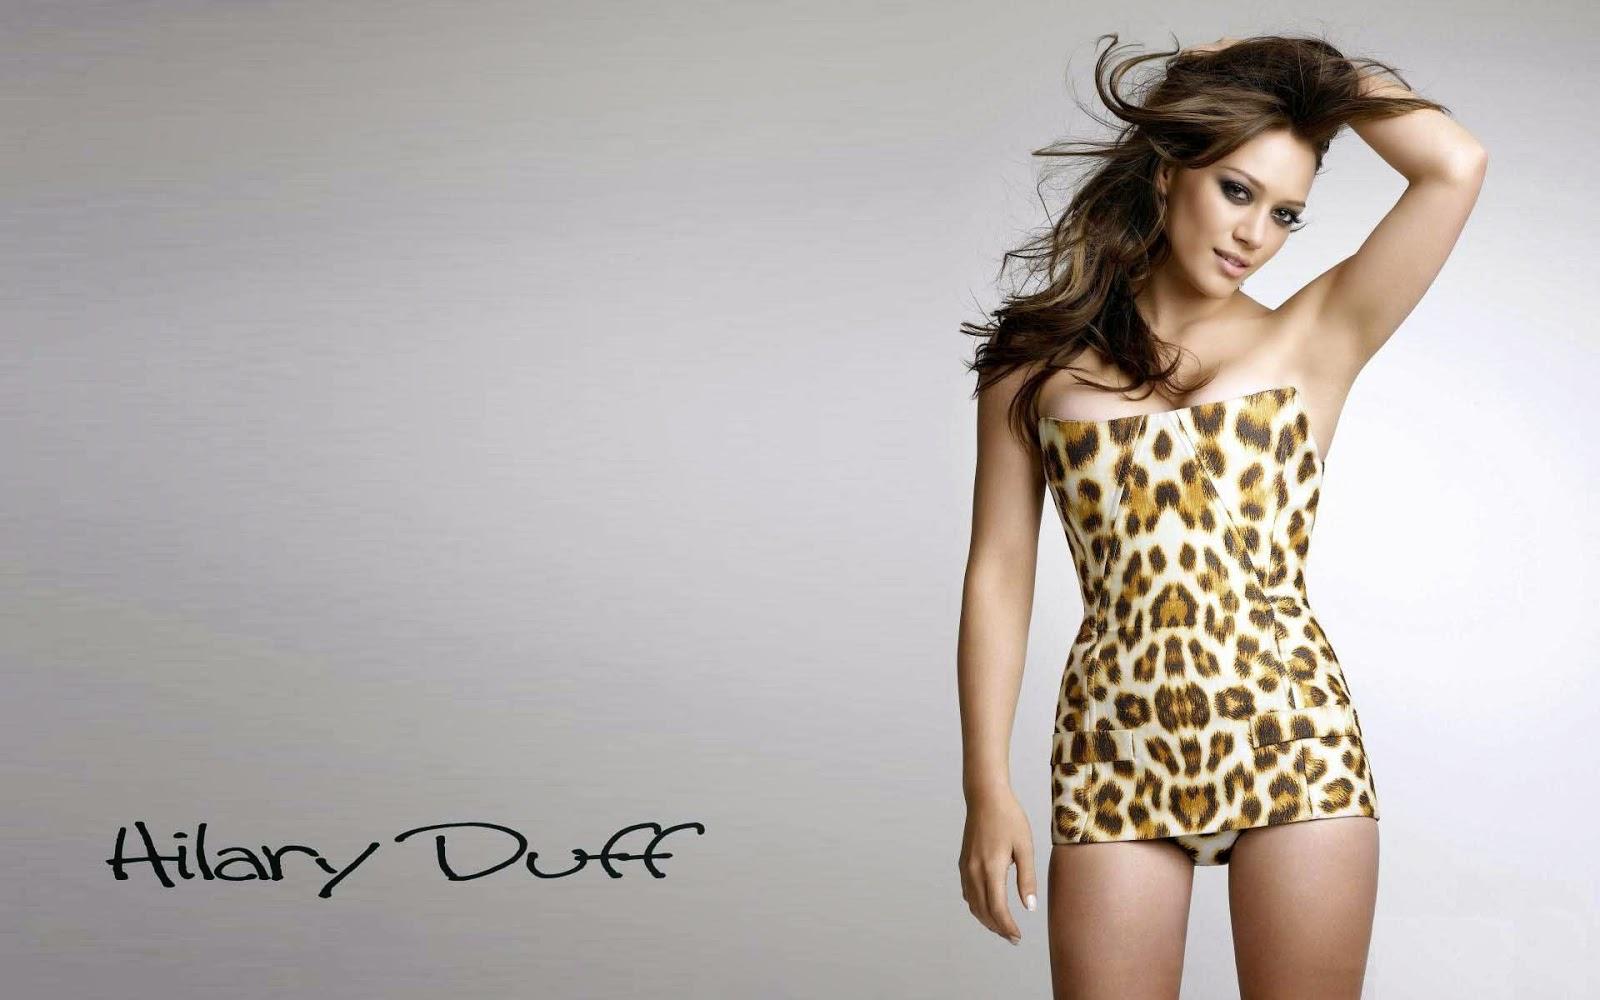 Hilary duff short top cloth wallpapers